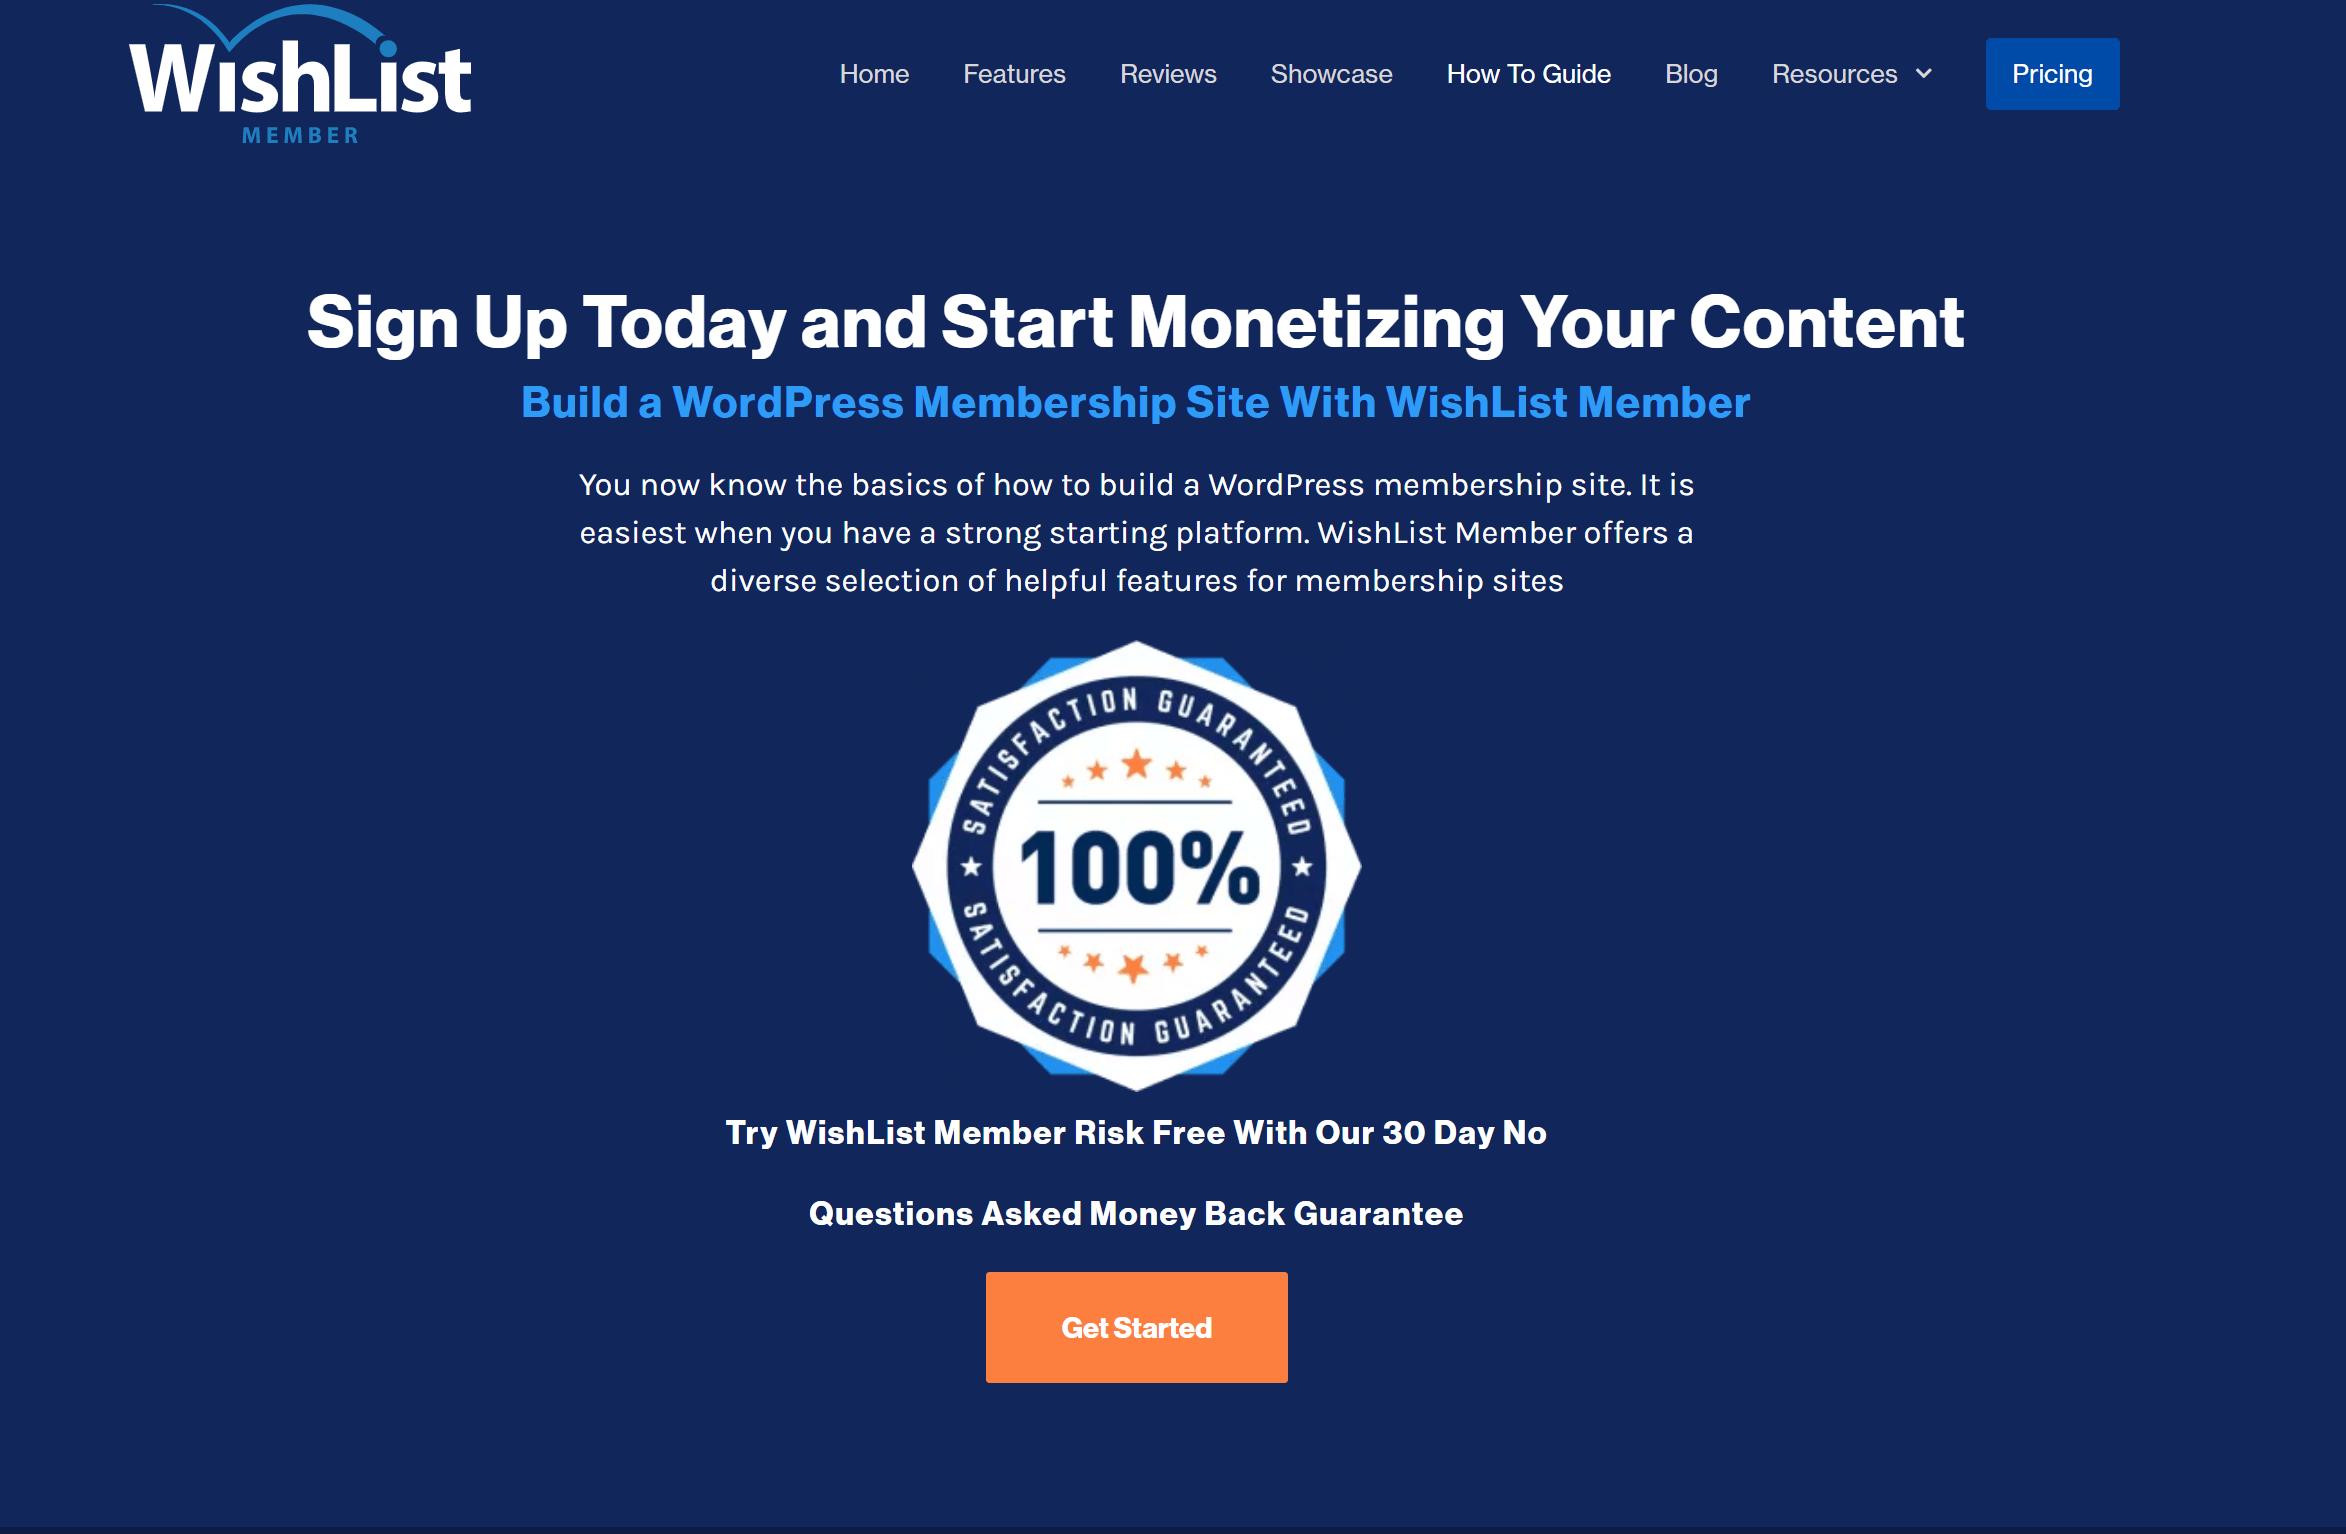 Wishlist member pricing guarantee